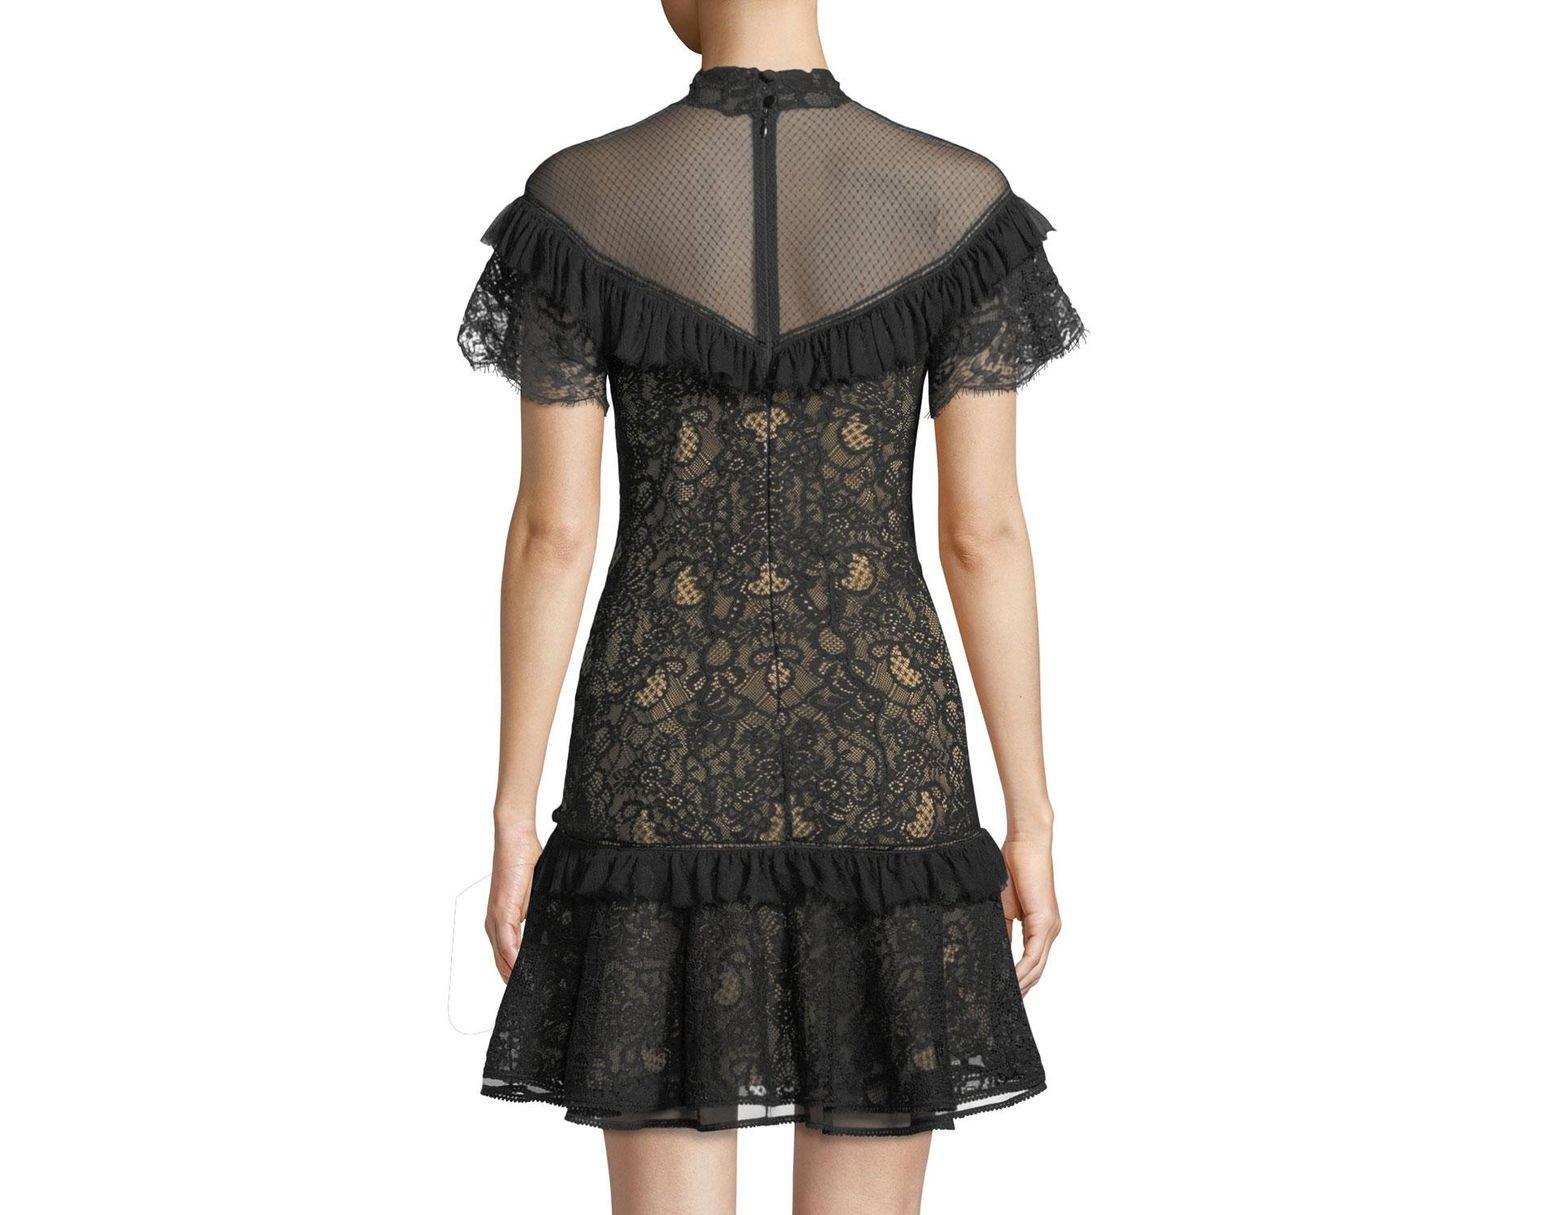 215496a994a Jonathan Simkhai Mock-neck Lace Ruffle Short Dress in Black - Save 70% -  Lyst